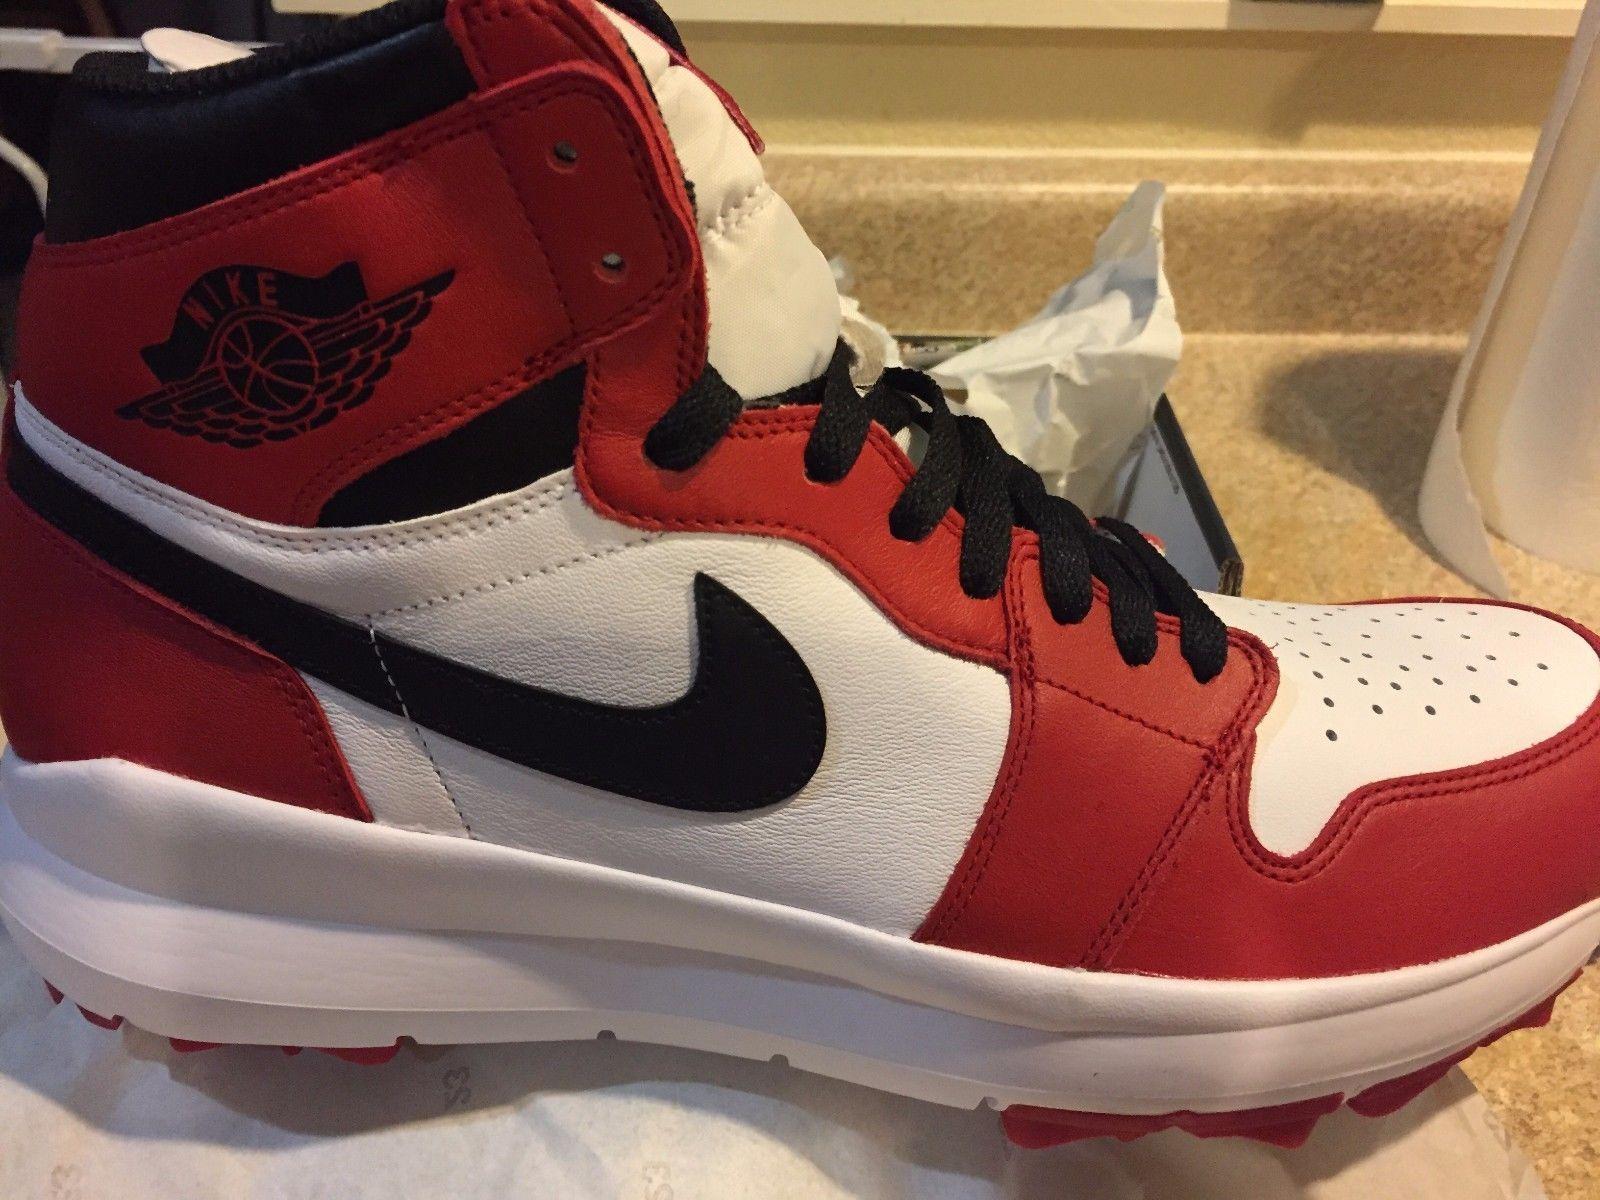 Nike Air Jordan Retro 1 Golf Shoes